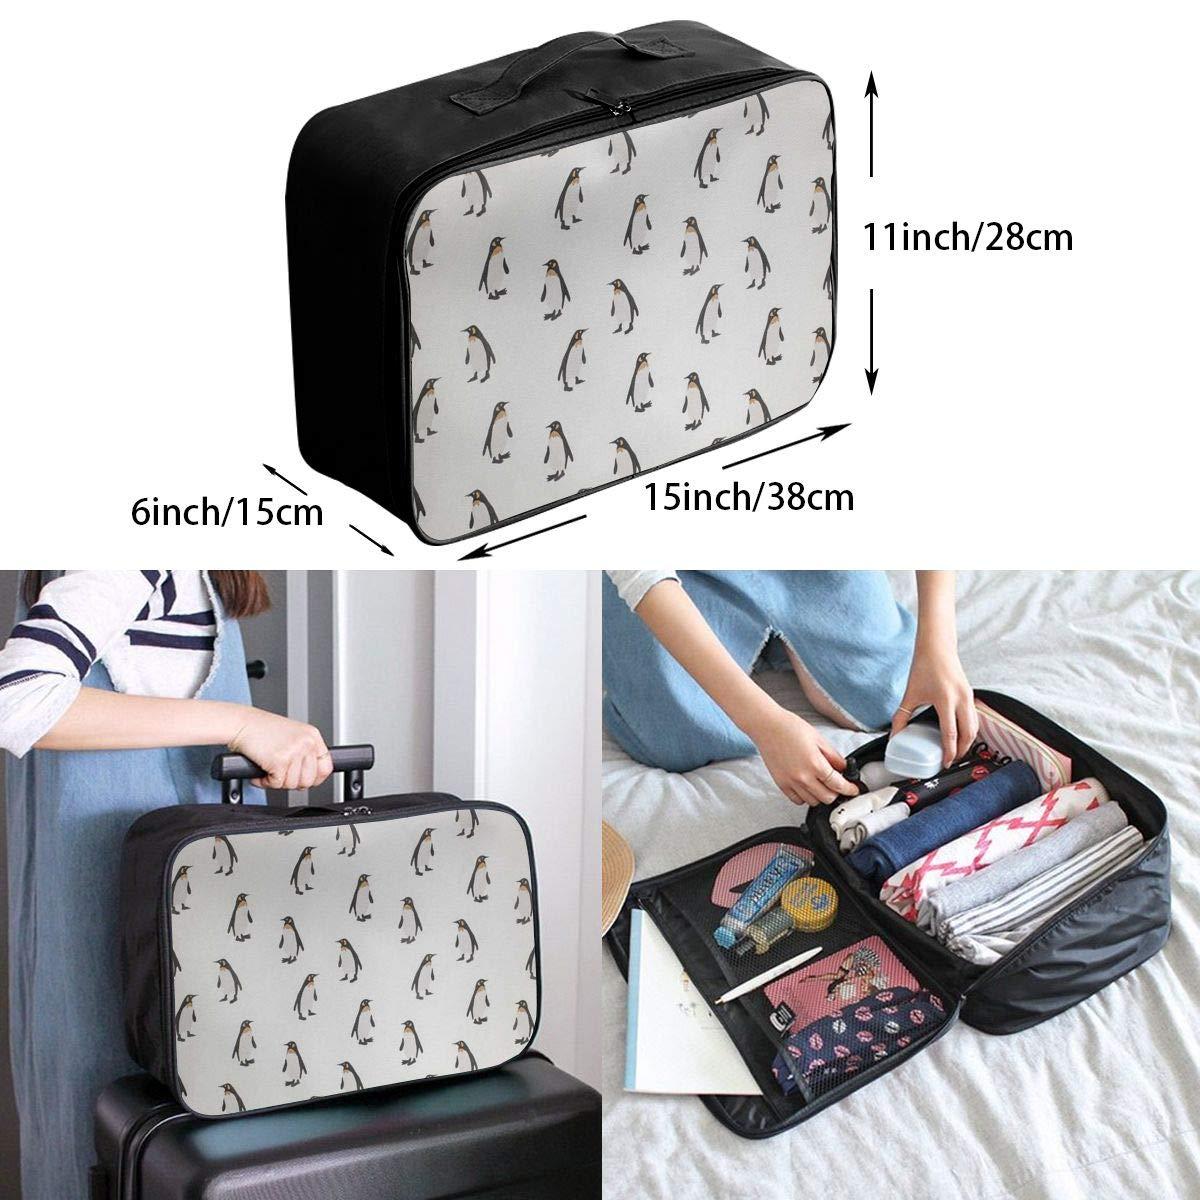 Travel Luggage Duffle Bag Lightweight Portable Handbag Penguin Pattern Large Capacity Waterproof Foldable Storage Tote